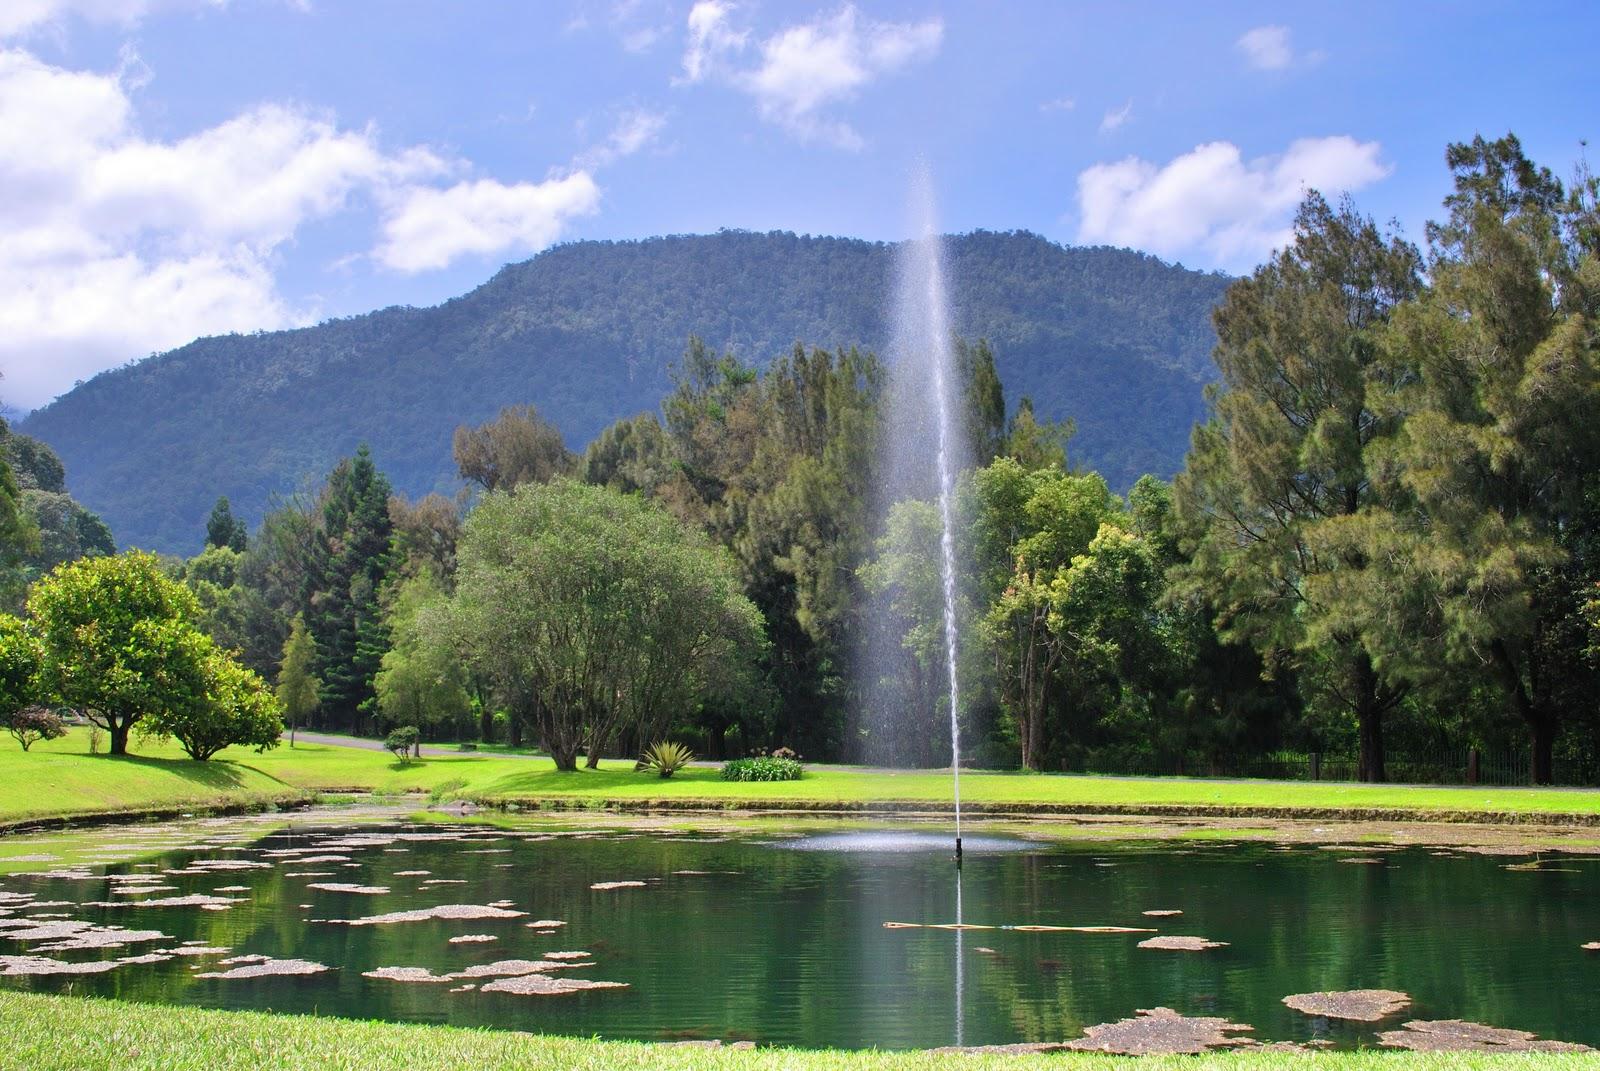 cibodas botanical garden in cianjur west java